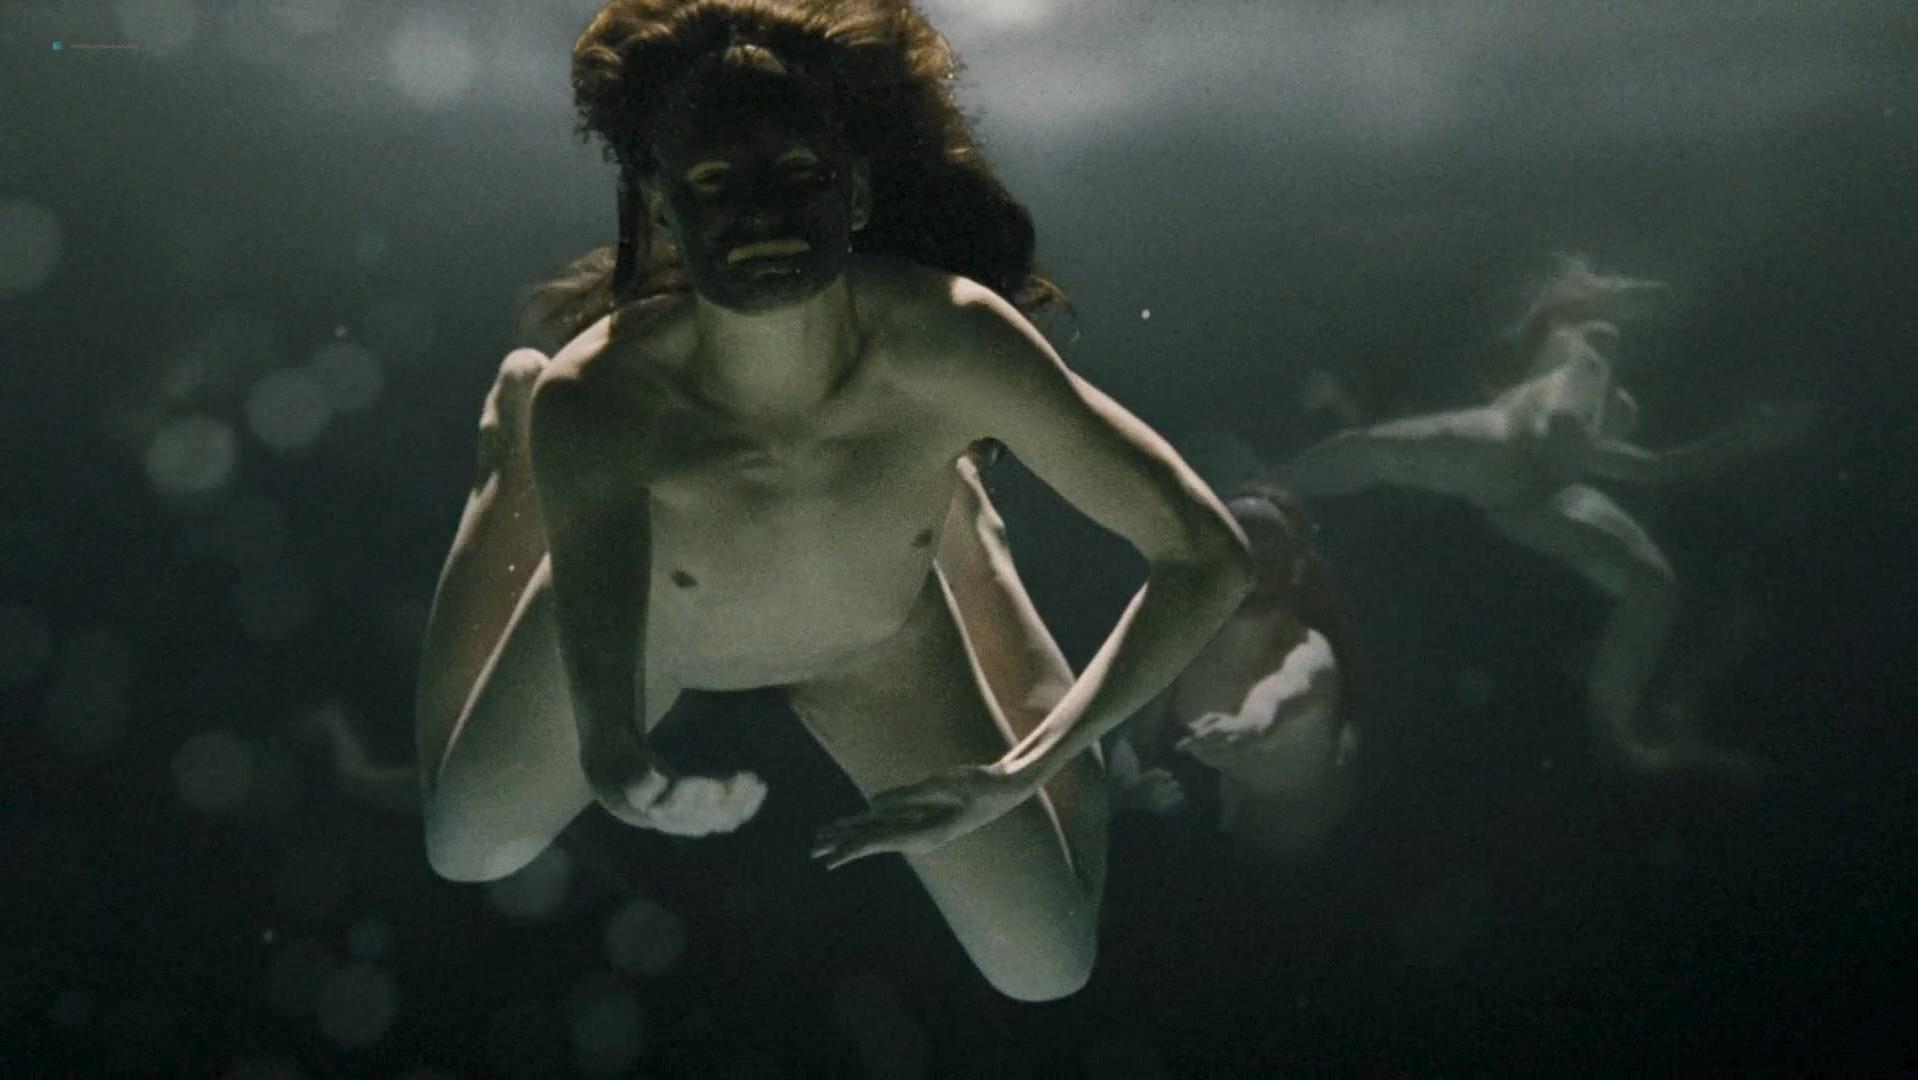 Sarah Zoe Canner nude, Katarzyna Herman nude - Prawdziwa historia (2009)